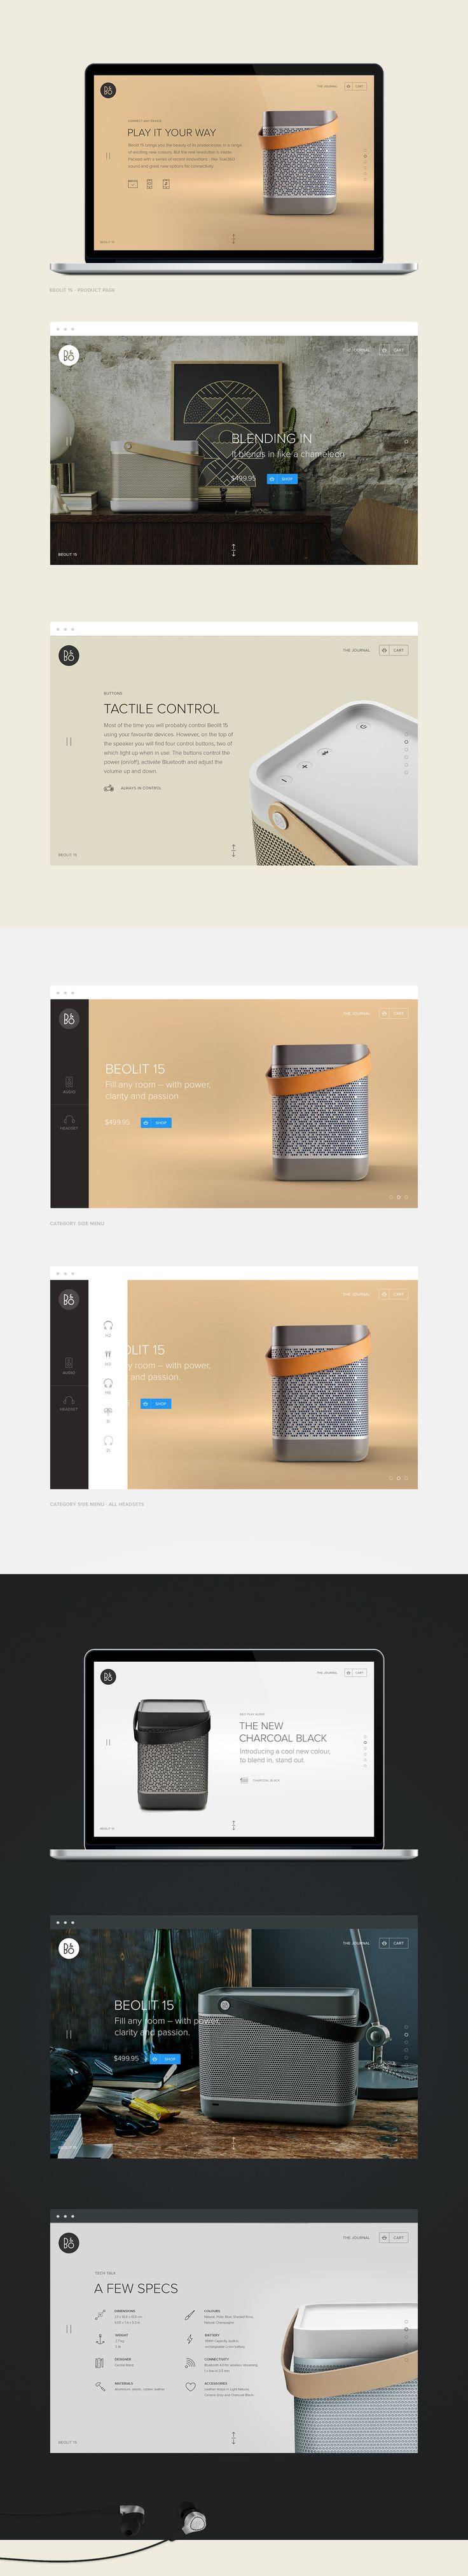 B&O Play - Design for music on Behance